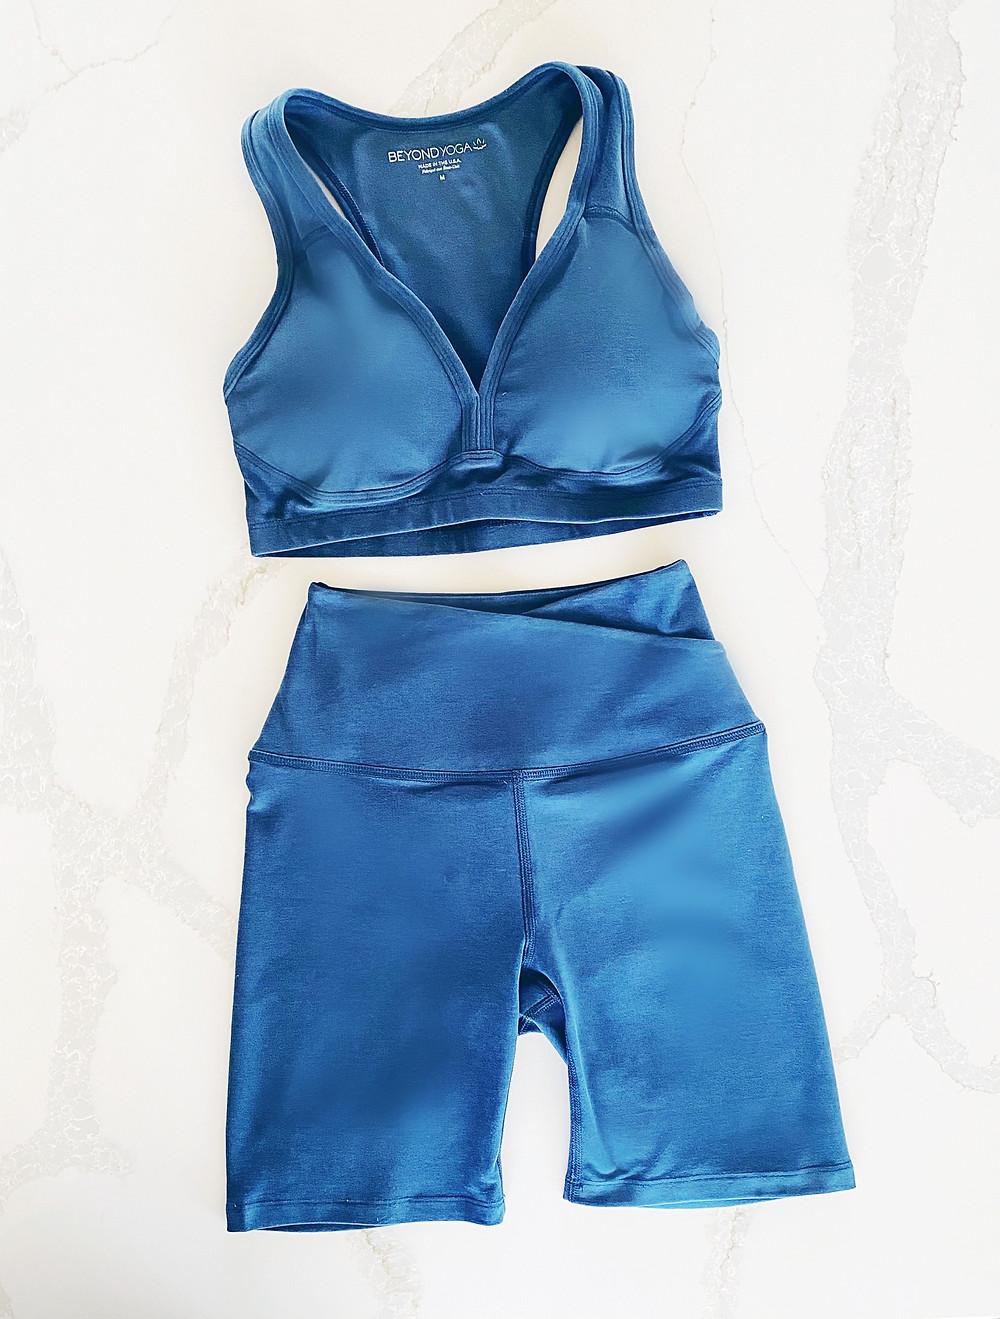 Yoga Fashion - Best Biker Shorts 2021 - Beyond Yoga Blue Heather